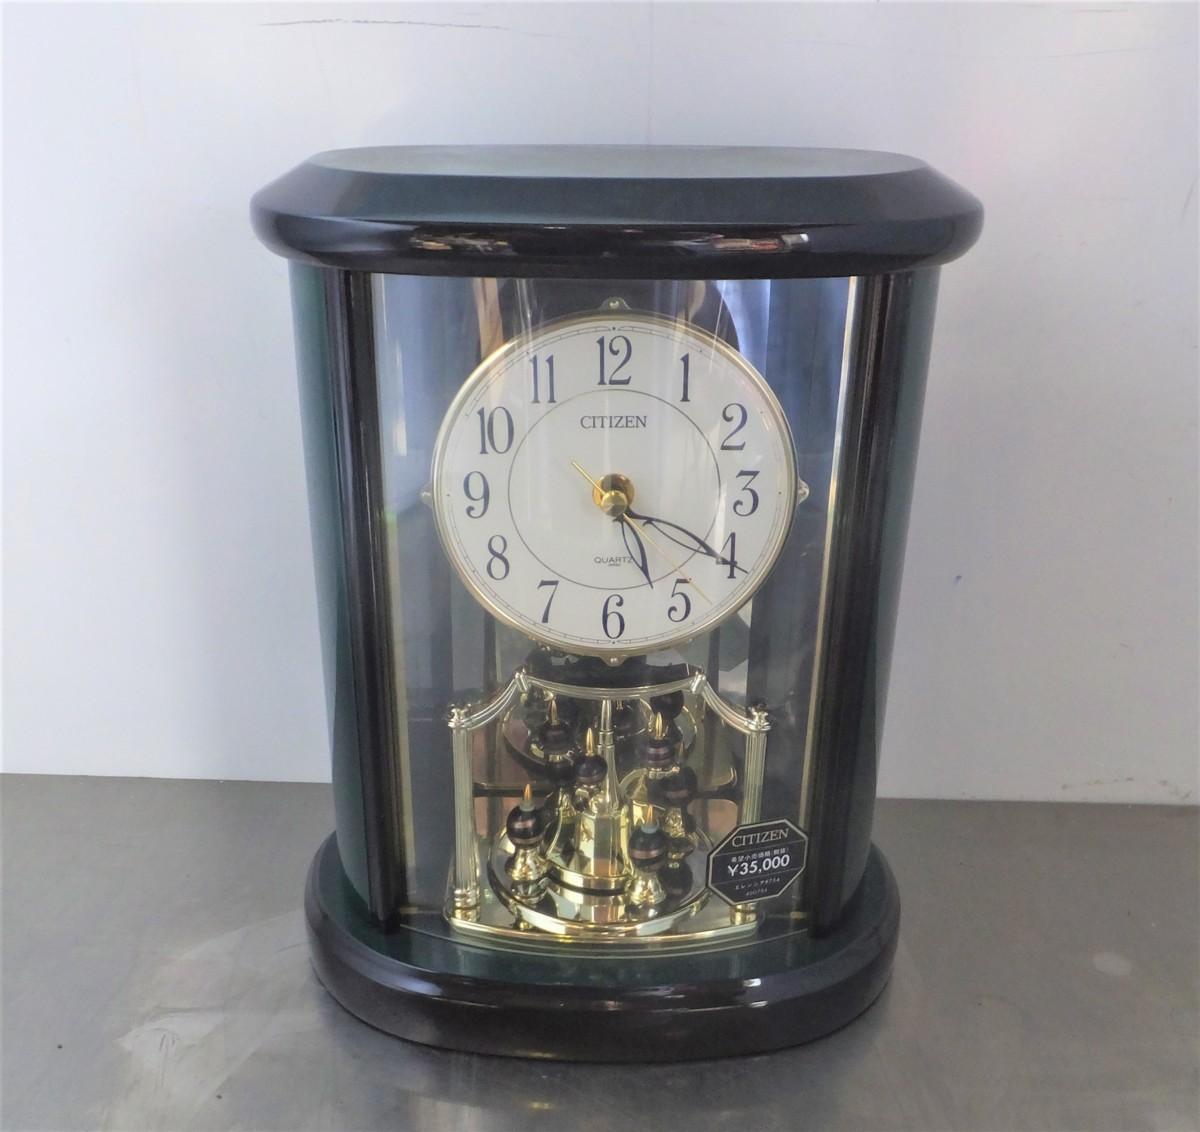 ●CITIZEN エレンシアR754 4SG754 置き時計(展示品)_画像1